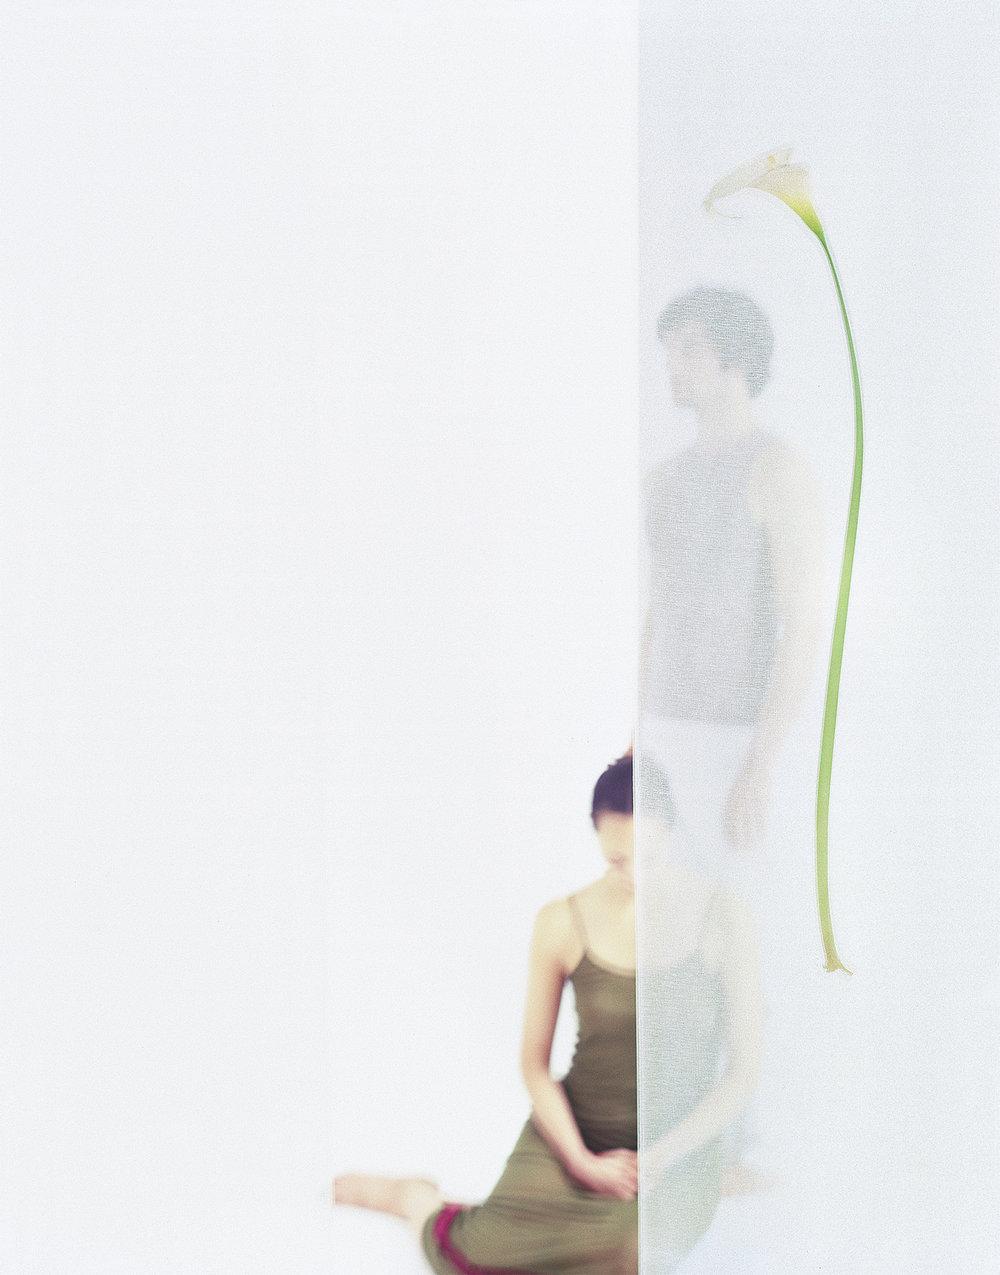 PARFUM_eux&gaze&arome_002©AudeSIRVAIN copie.jpg